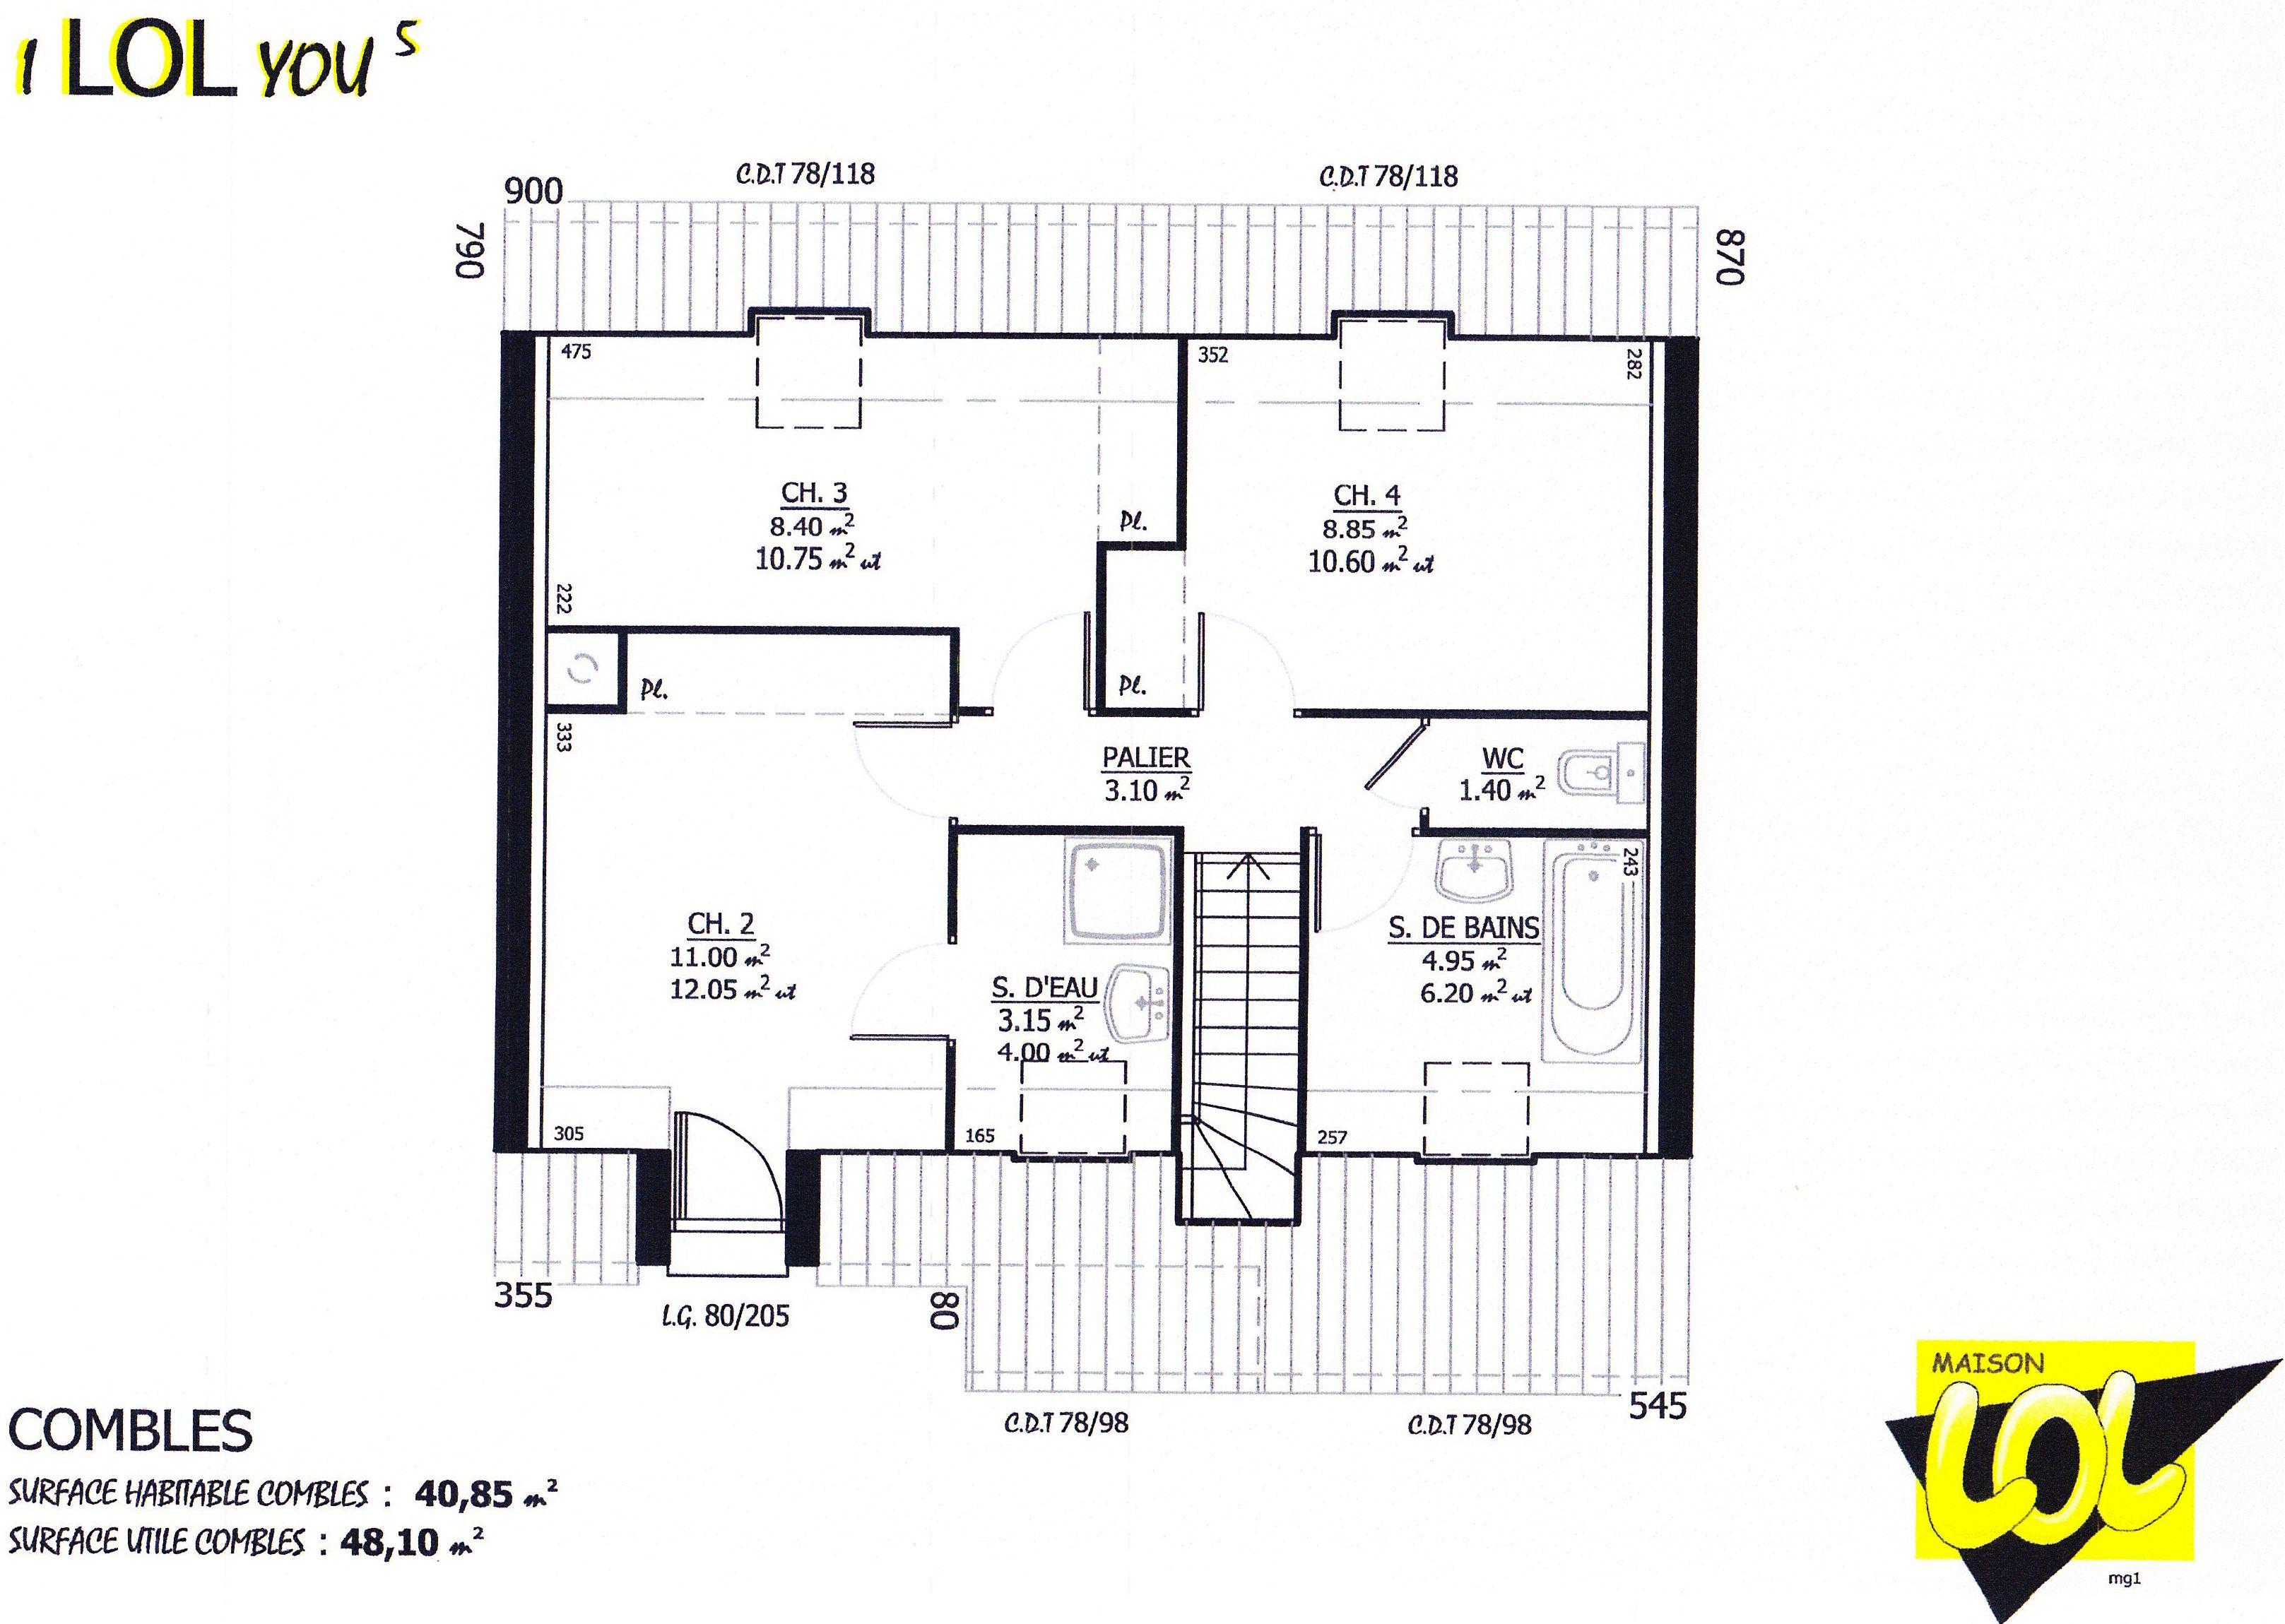 Maison ilolyou maison lol 122323 euros 100 3 m2 faire construire sa